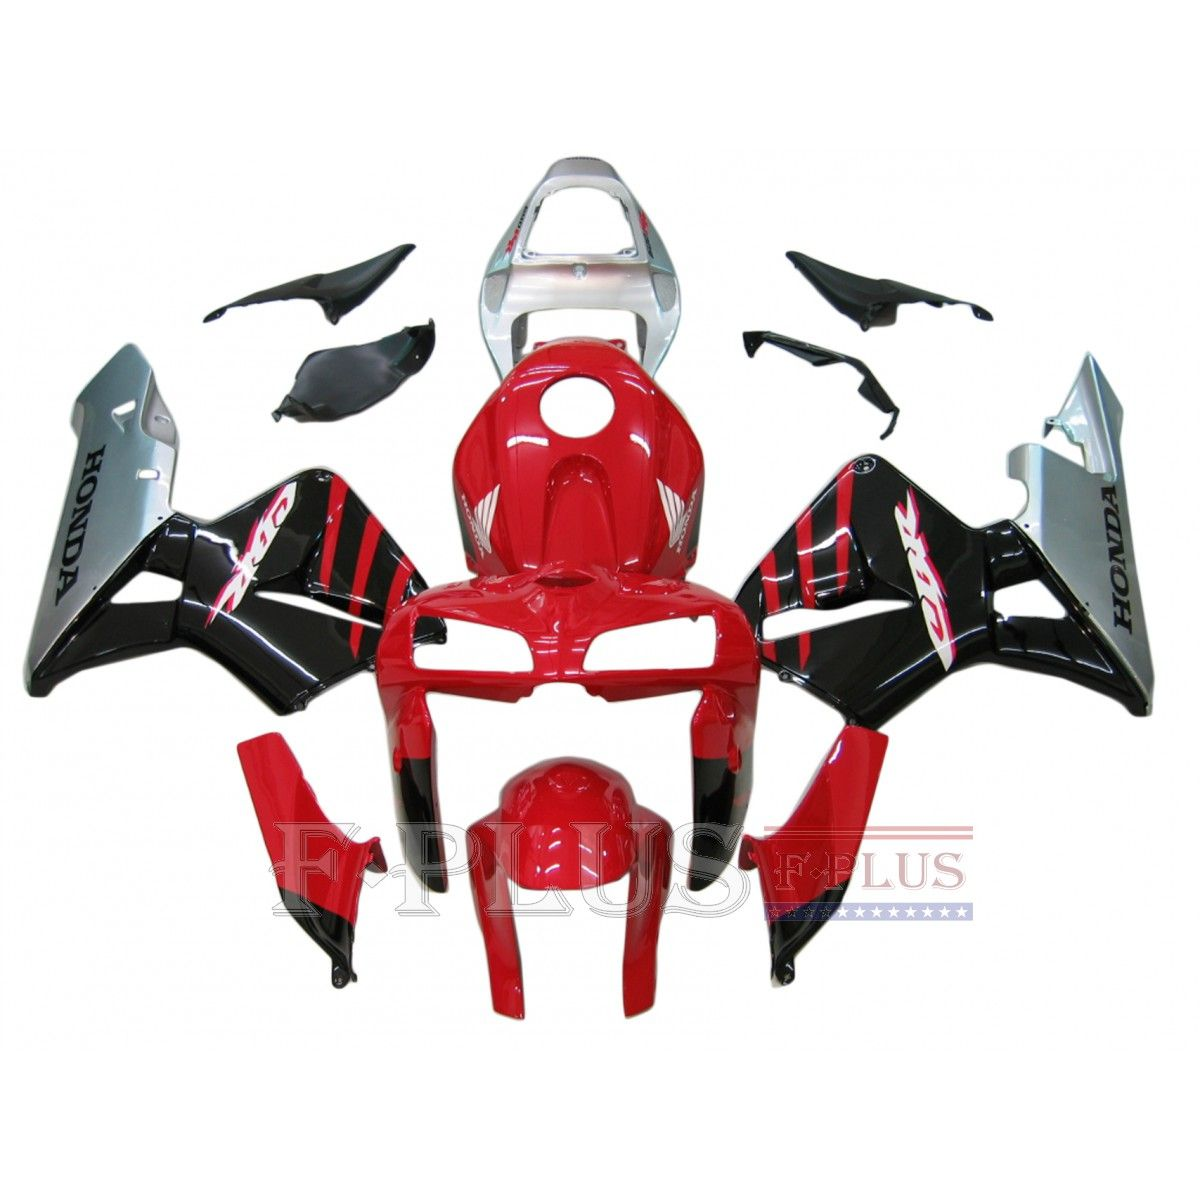 Aftermarket Fairings For Honda CBR600RR 05-06 Red Black  ABS Kits 2005 2006